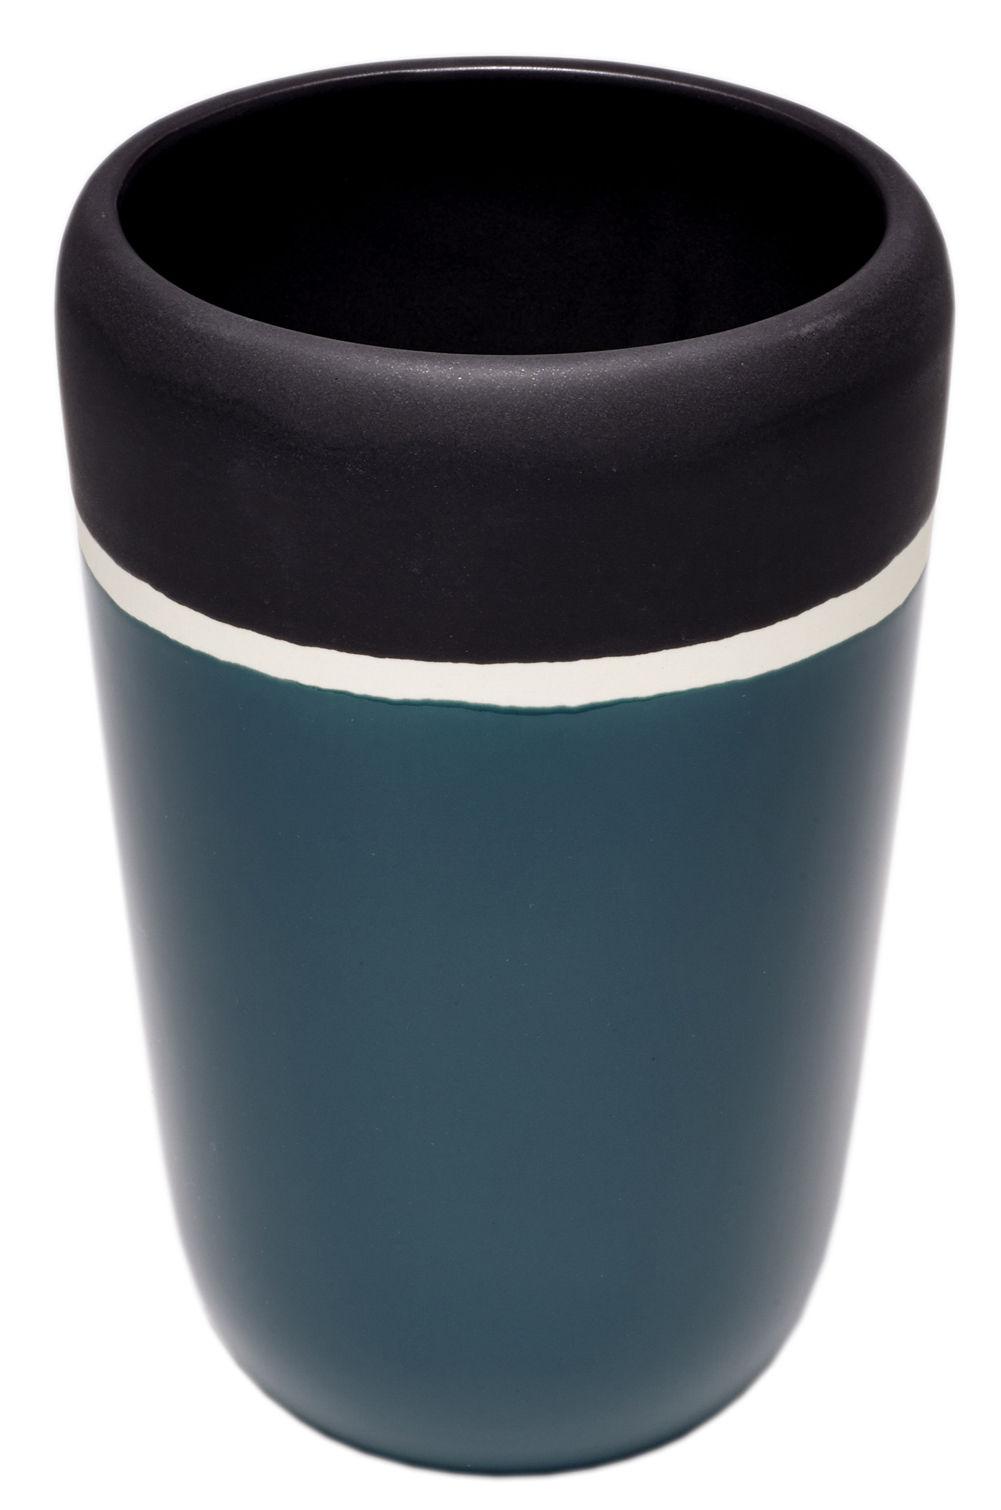 "Dekoration - Vasen - Sicilia Vase / H 20 cm - Maison Sarah Lavoine - Blau ""Sarah"" - emaillierte Keramik"